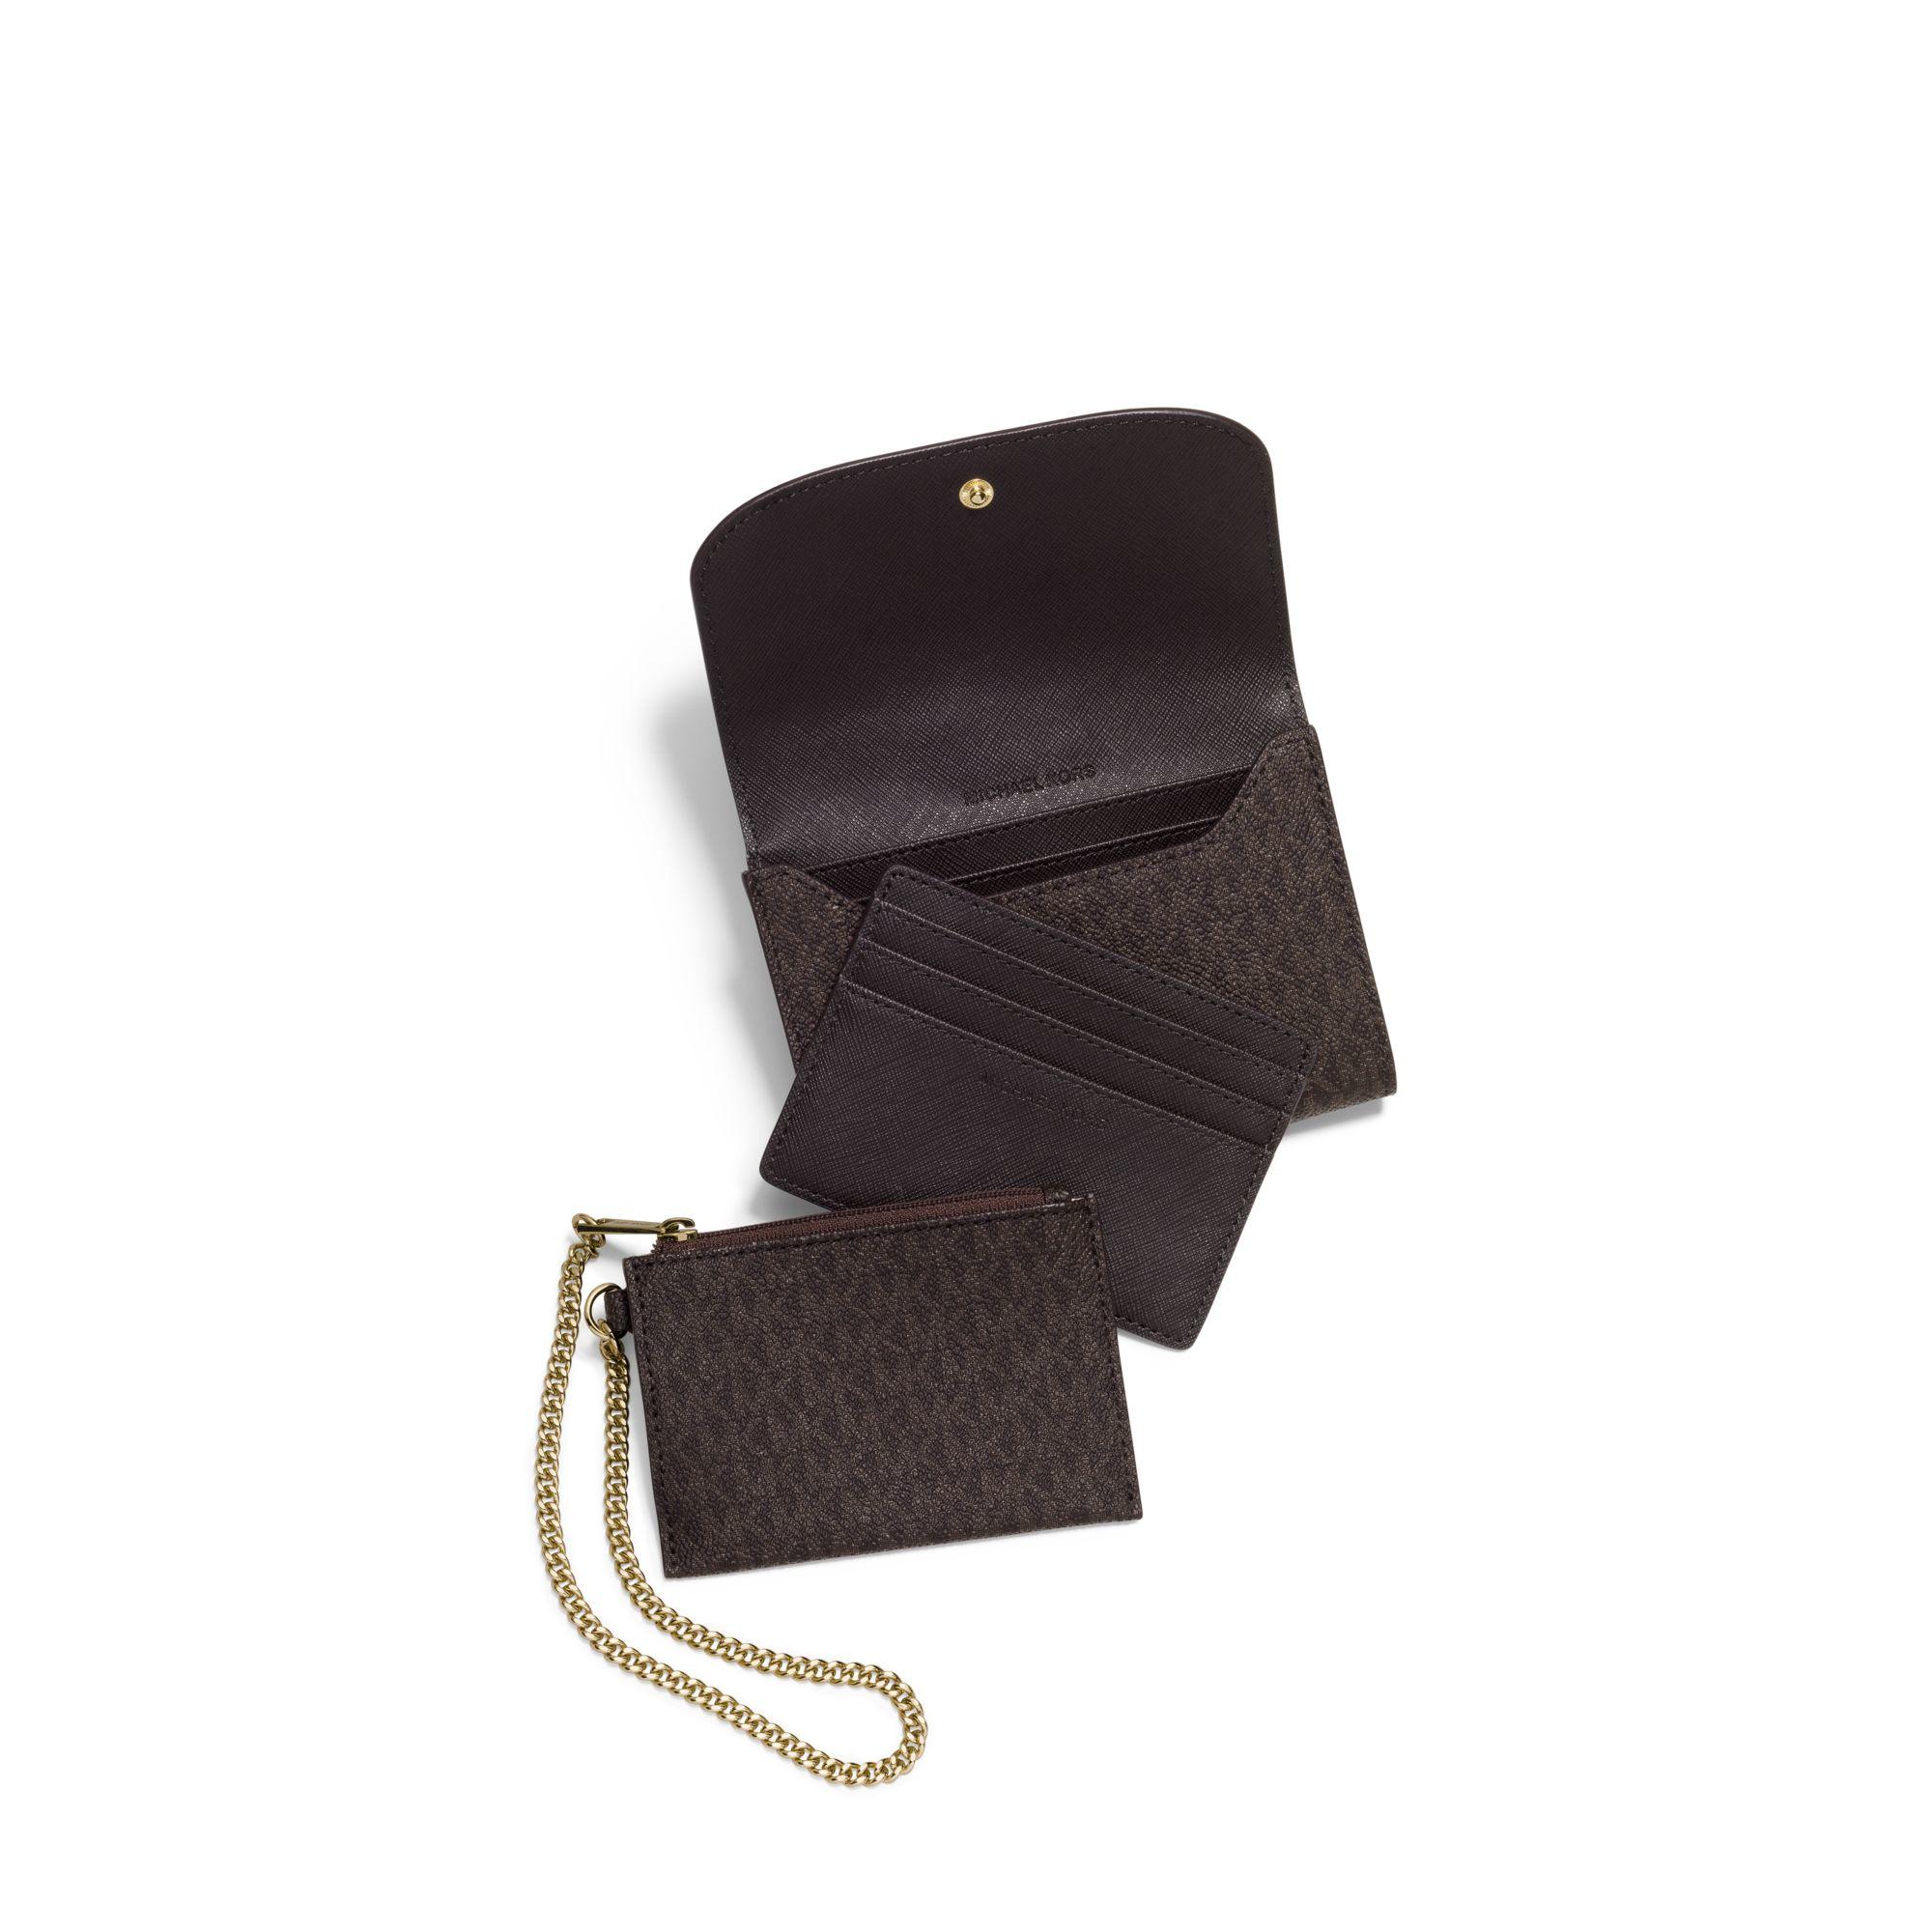 639c9316e6fb ... spain lyst michael kors juliana medium three in one wallet in brown  2cd57 f7d5e